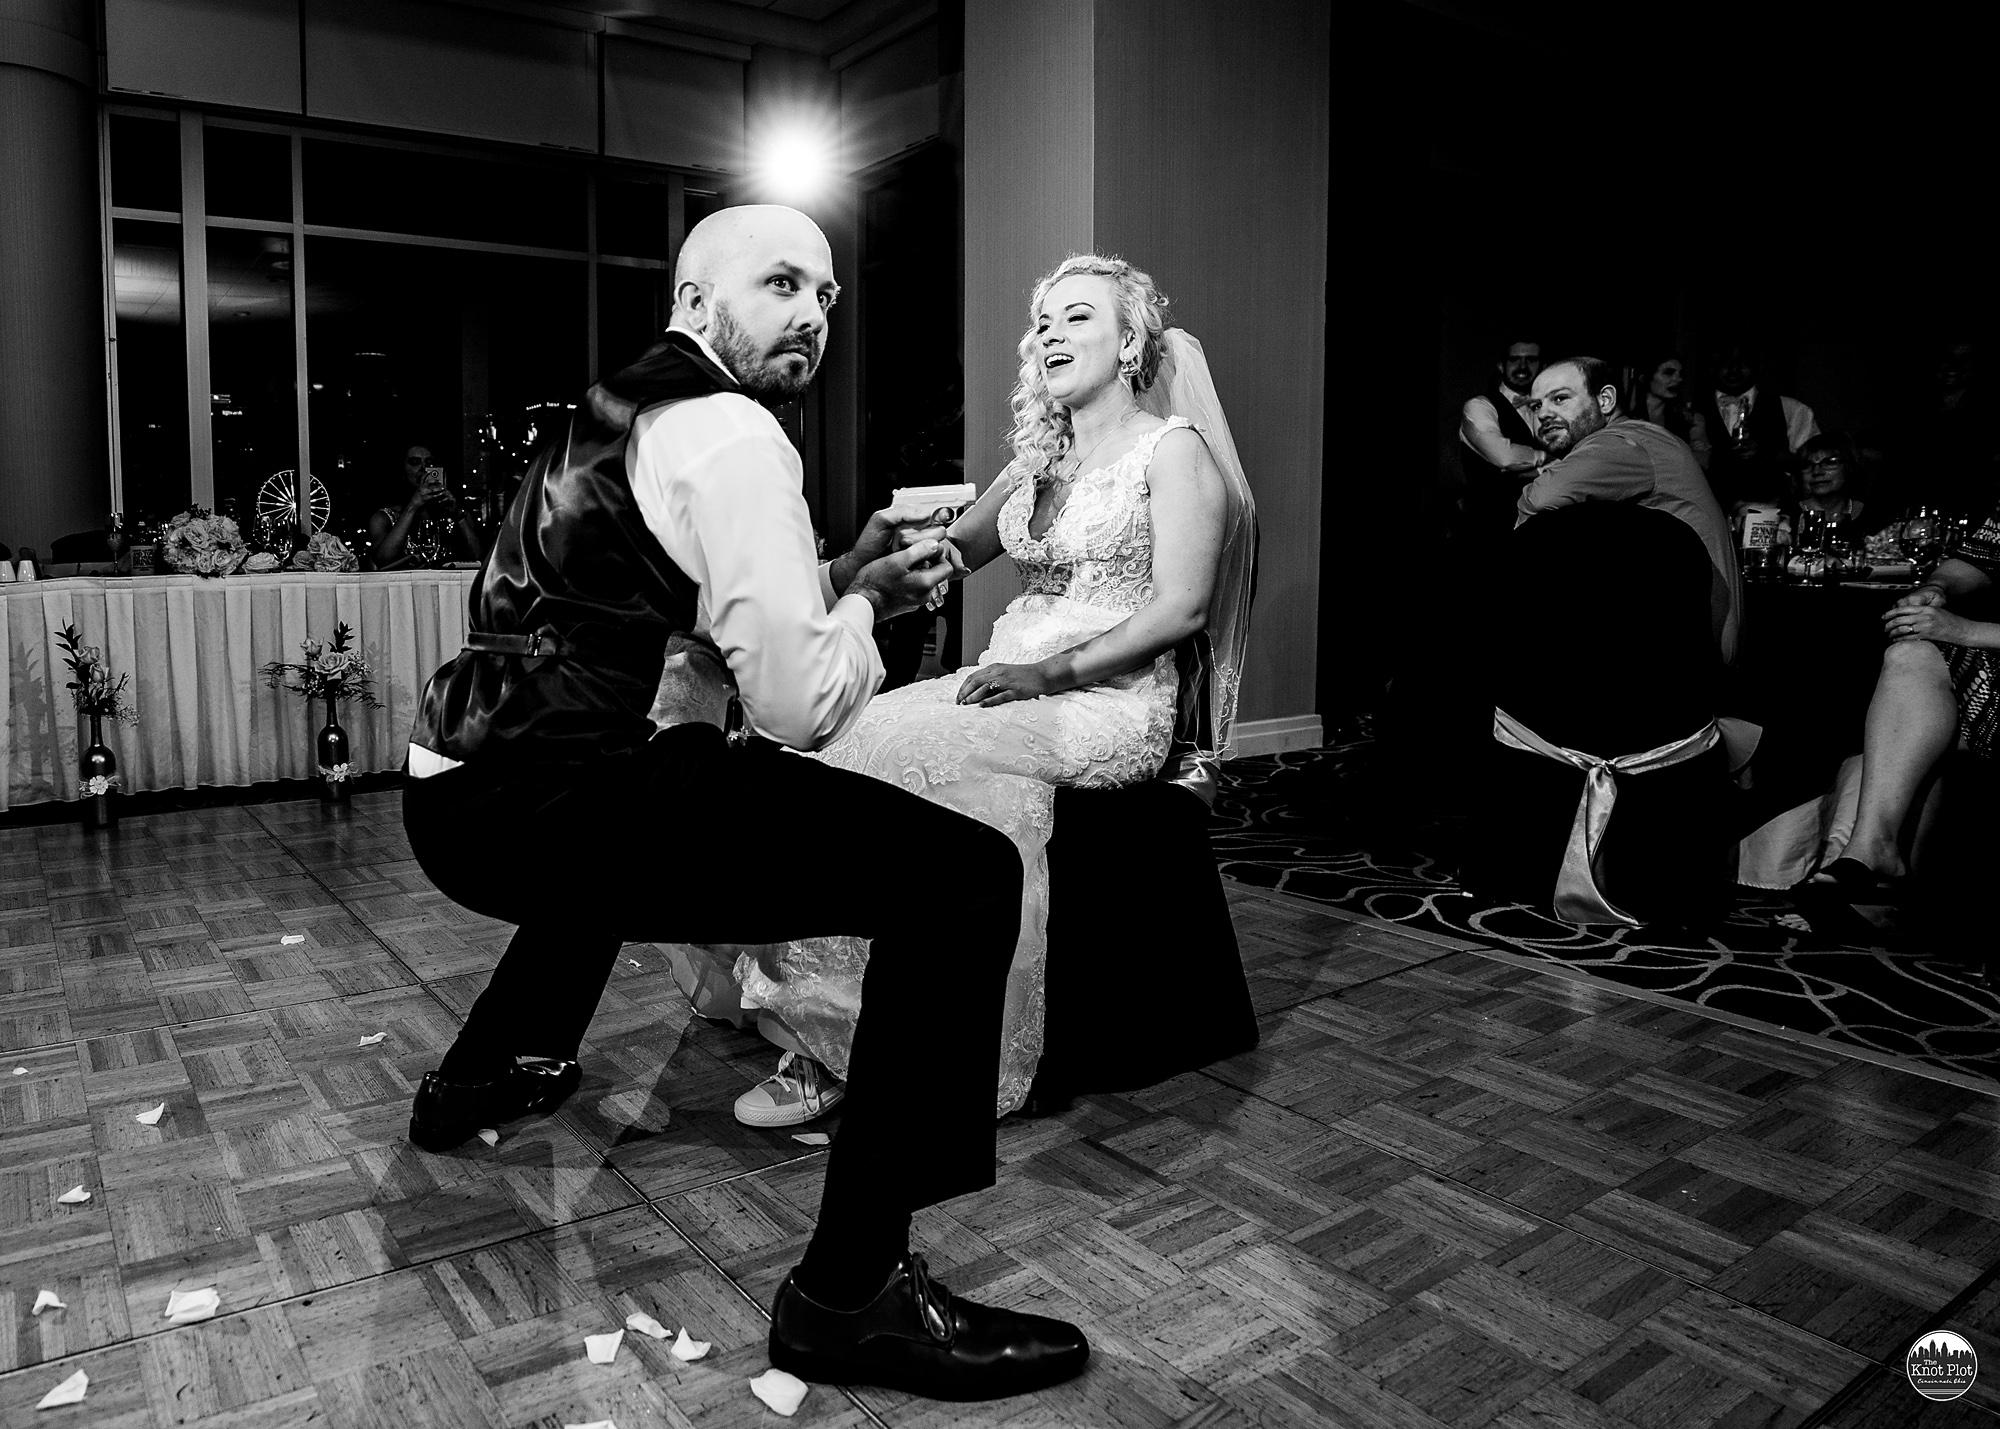 Embassy-Suites-Rivercenter-Cincinnati-Wedding-Photography-31.jpg